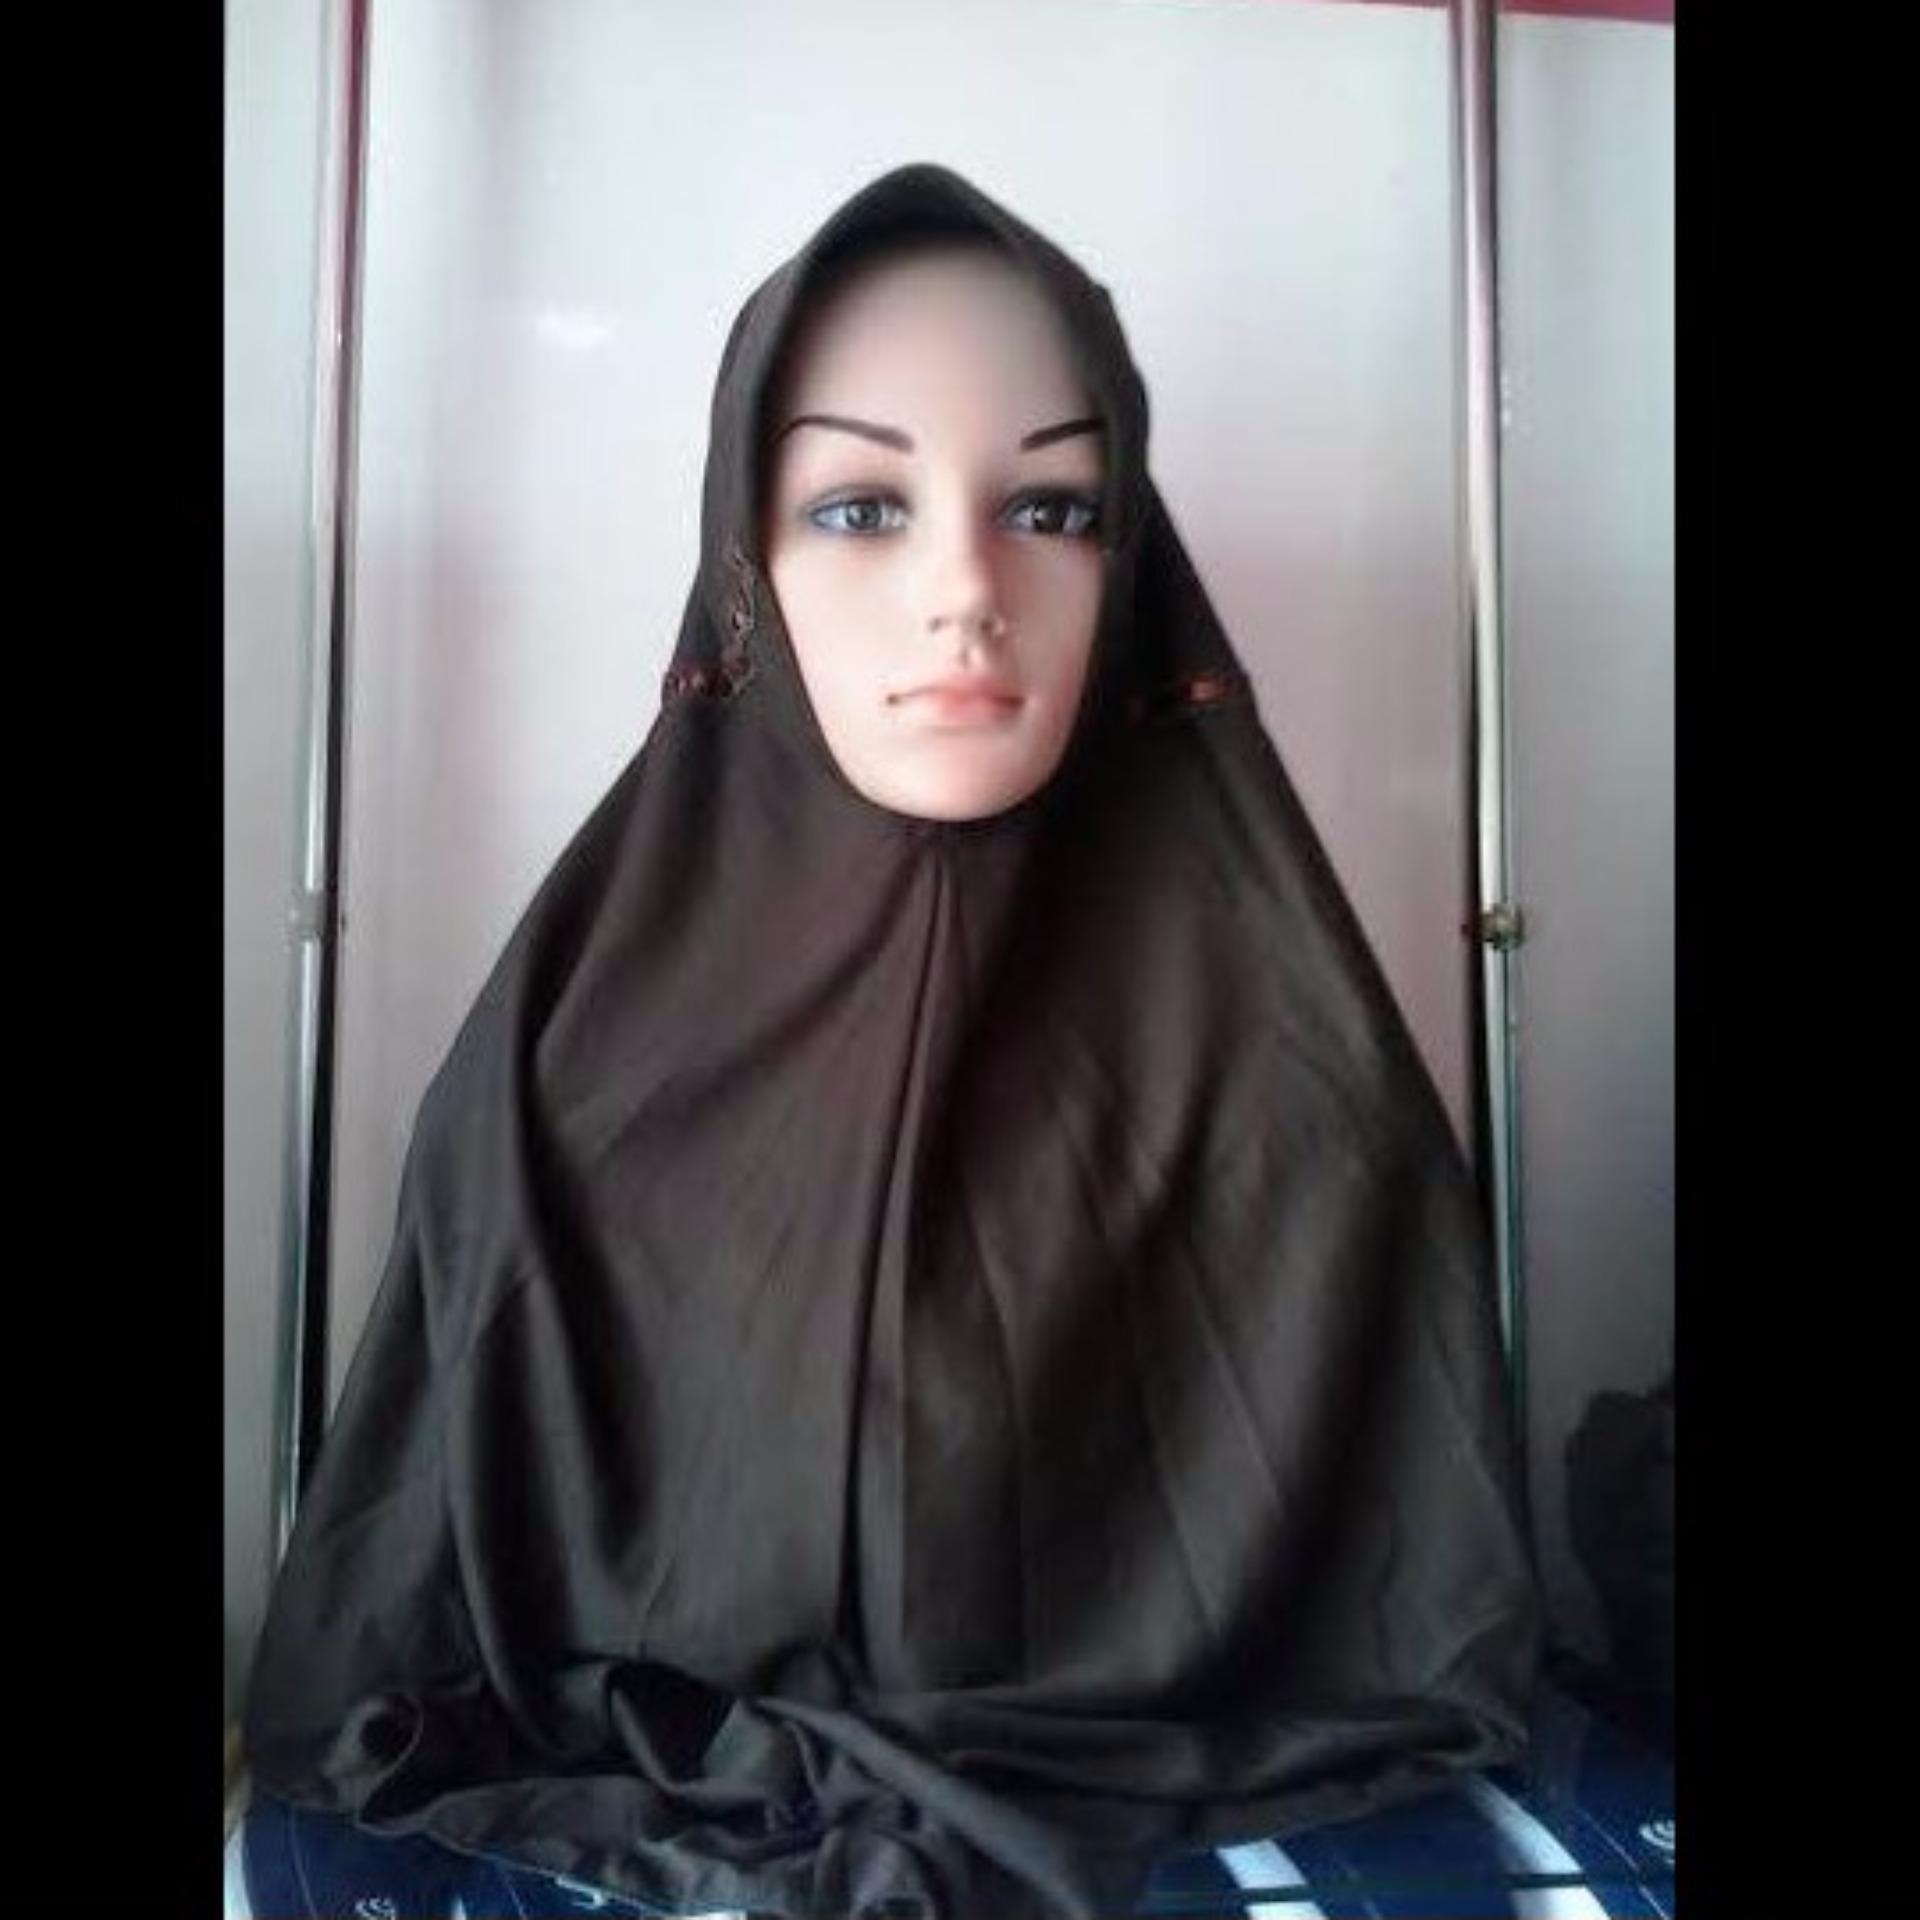 Spesifikasi Rabbani Kerudung Great Innova Jilbab Sekolah Coklat Tua Yg Baik